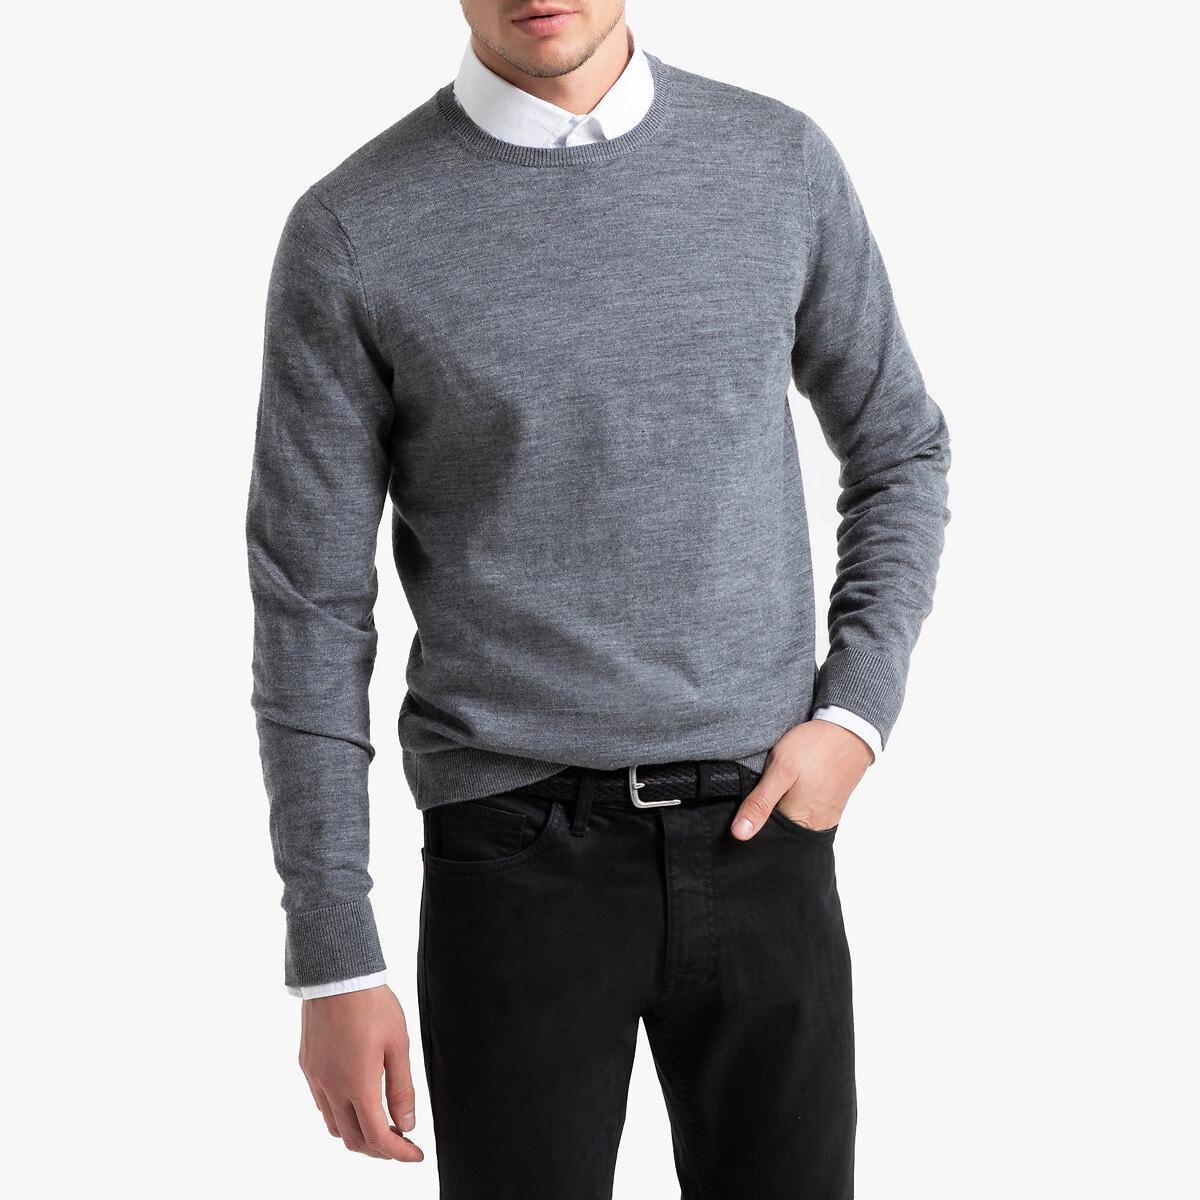 100% Merino Wool Crew Neck Jumper Sweater